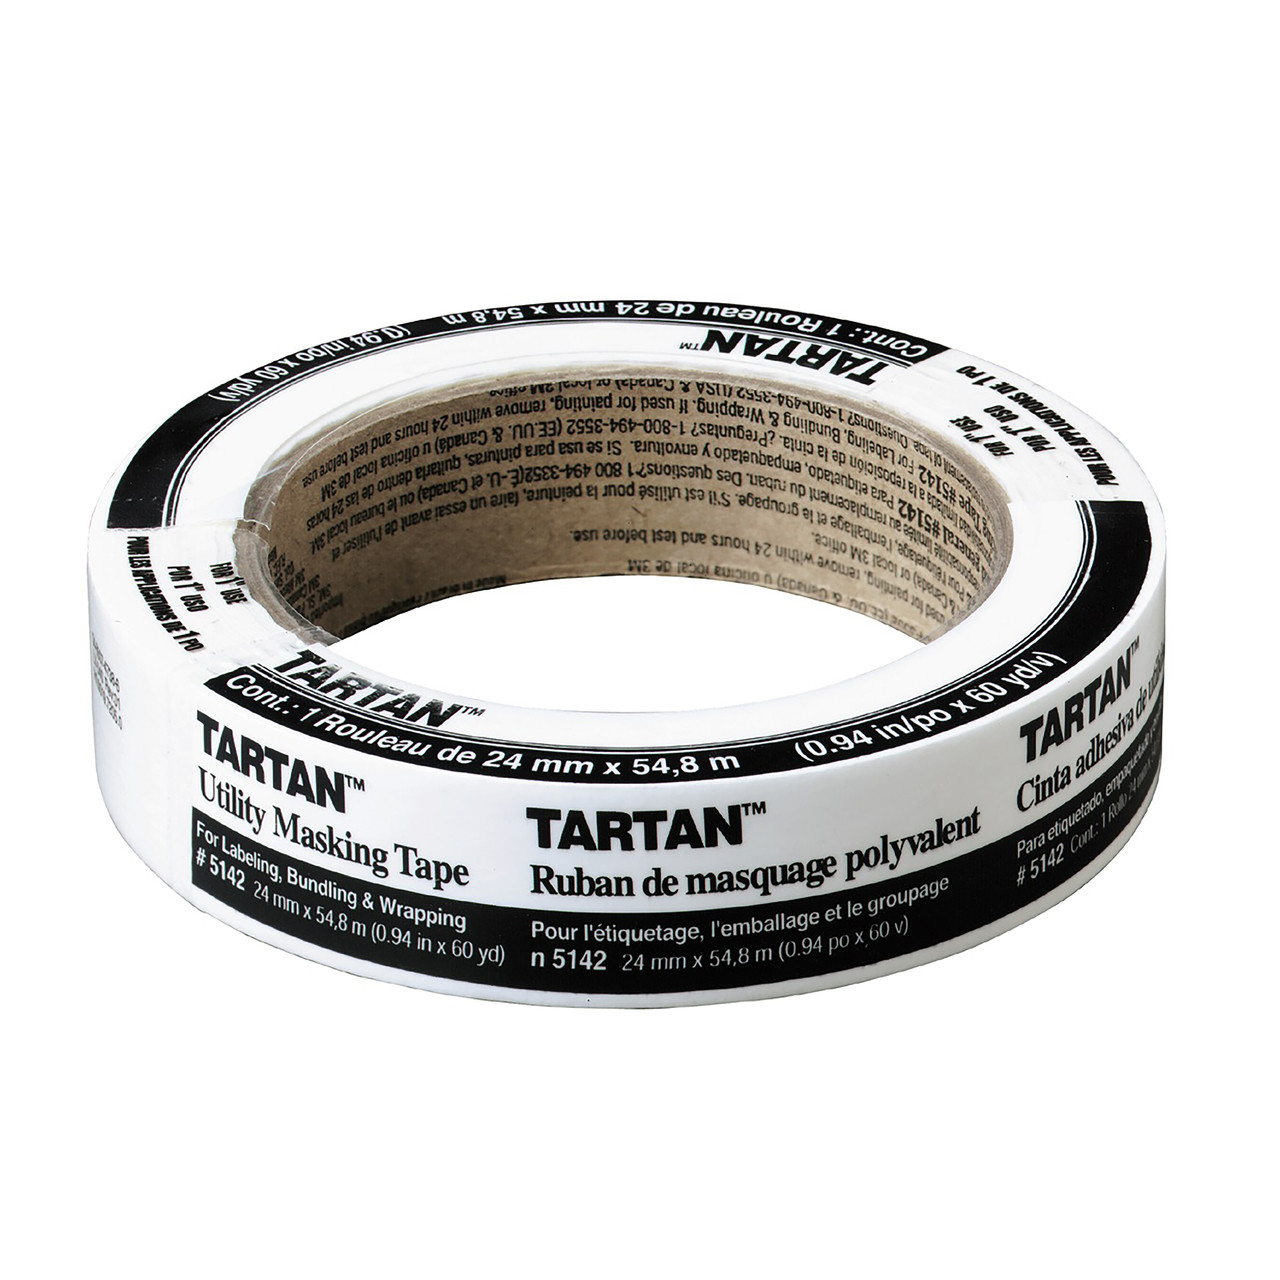 Tape Mask 5142-1-Ab 24mmx55mm